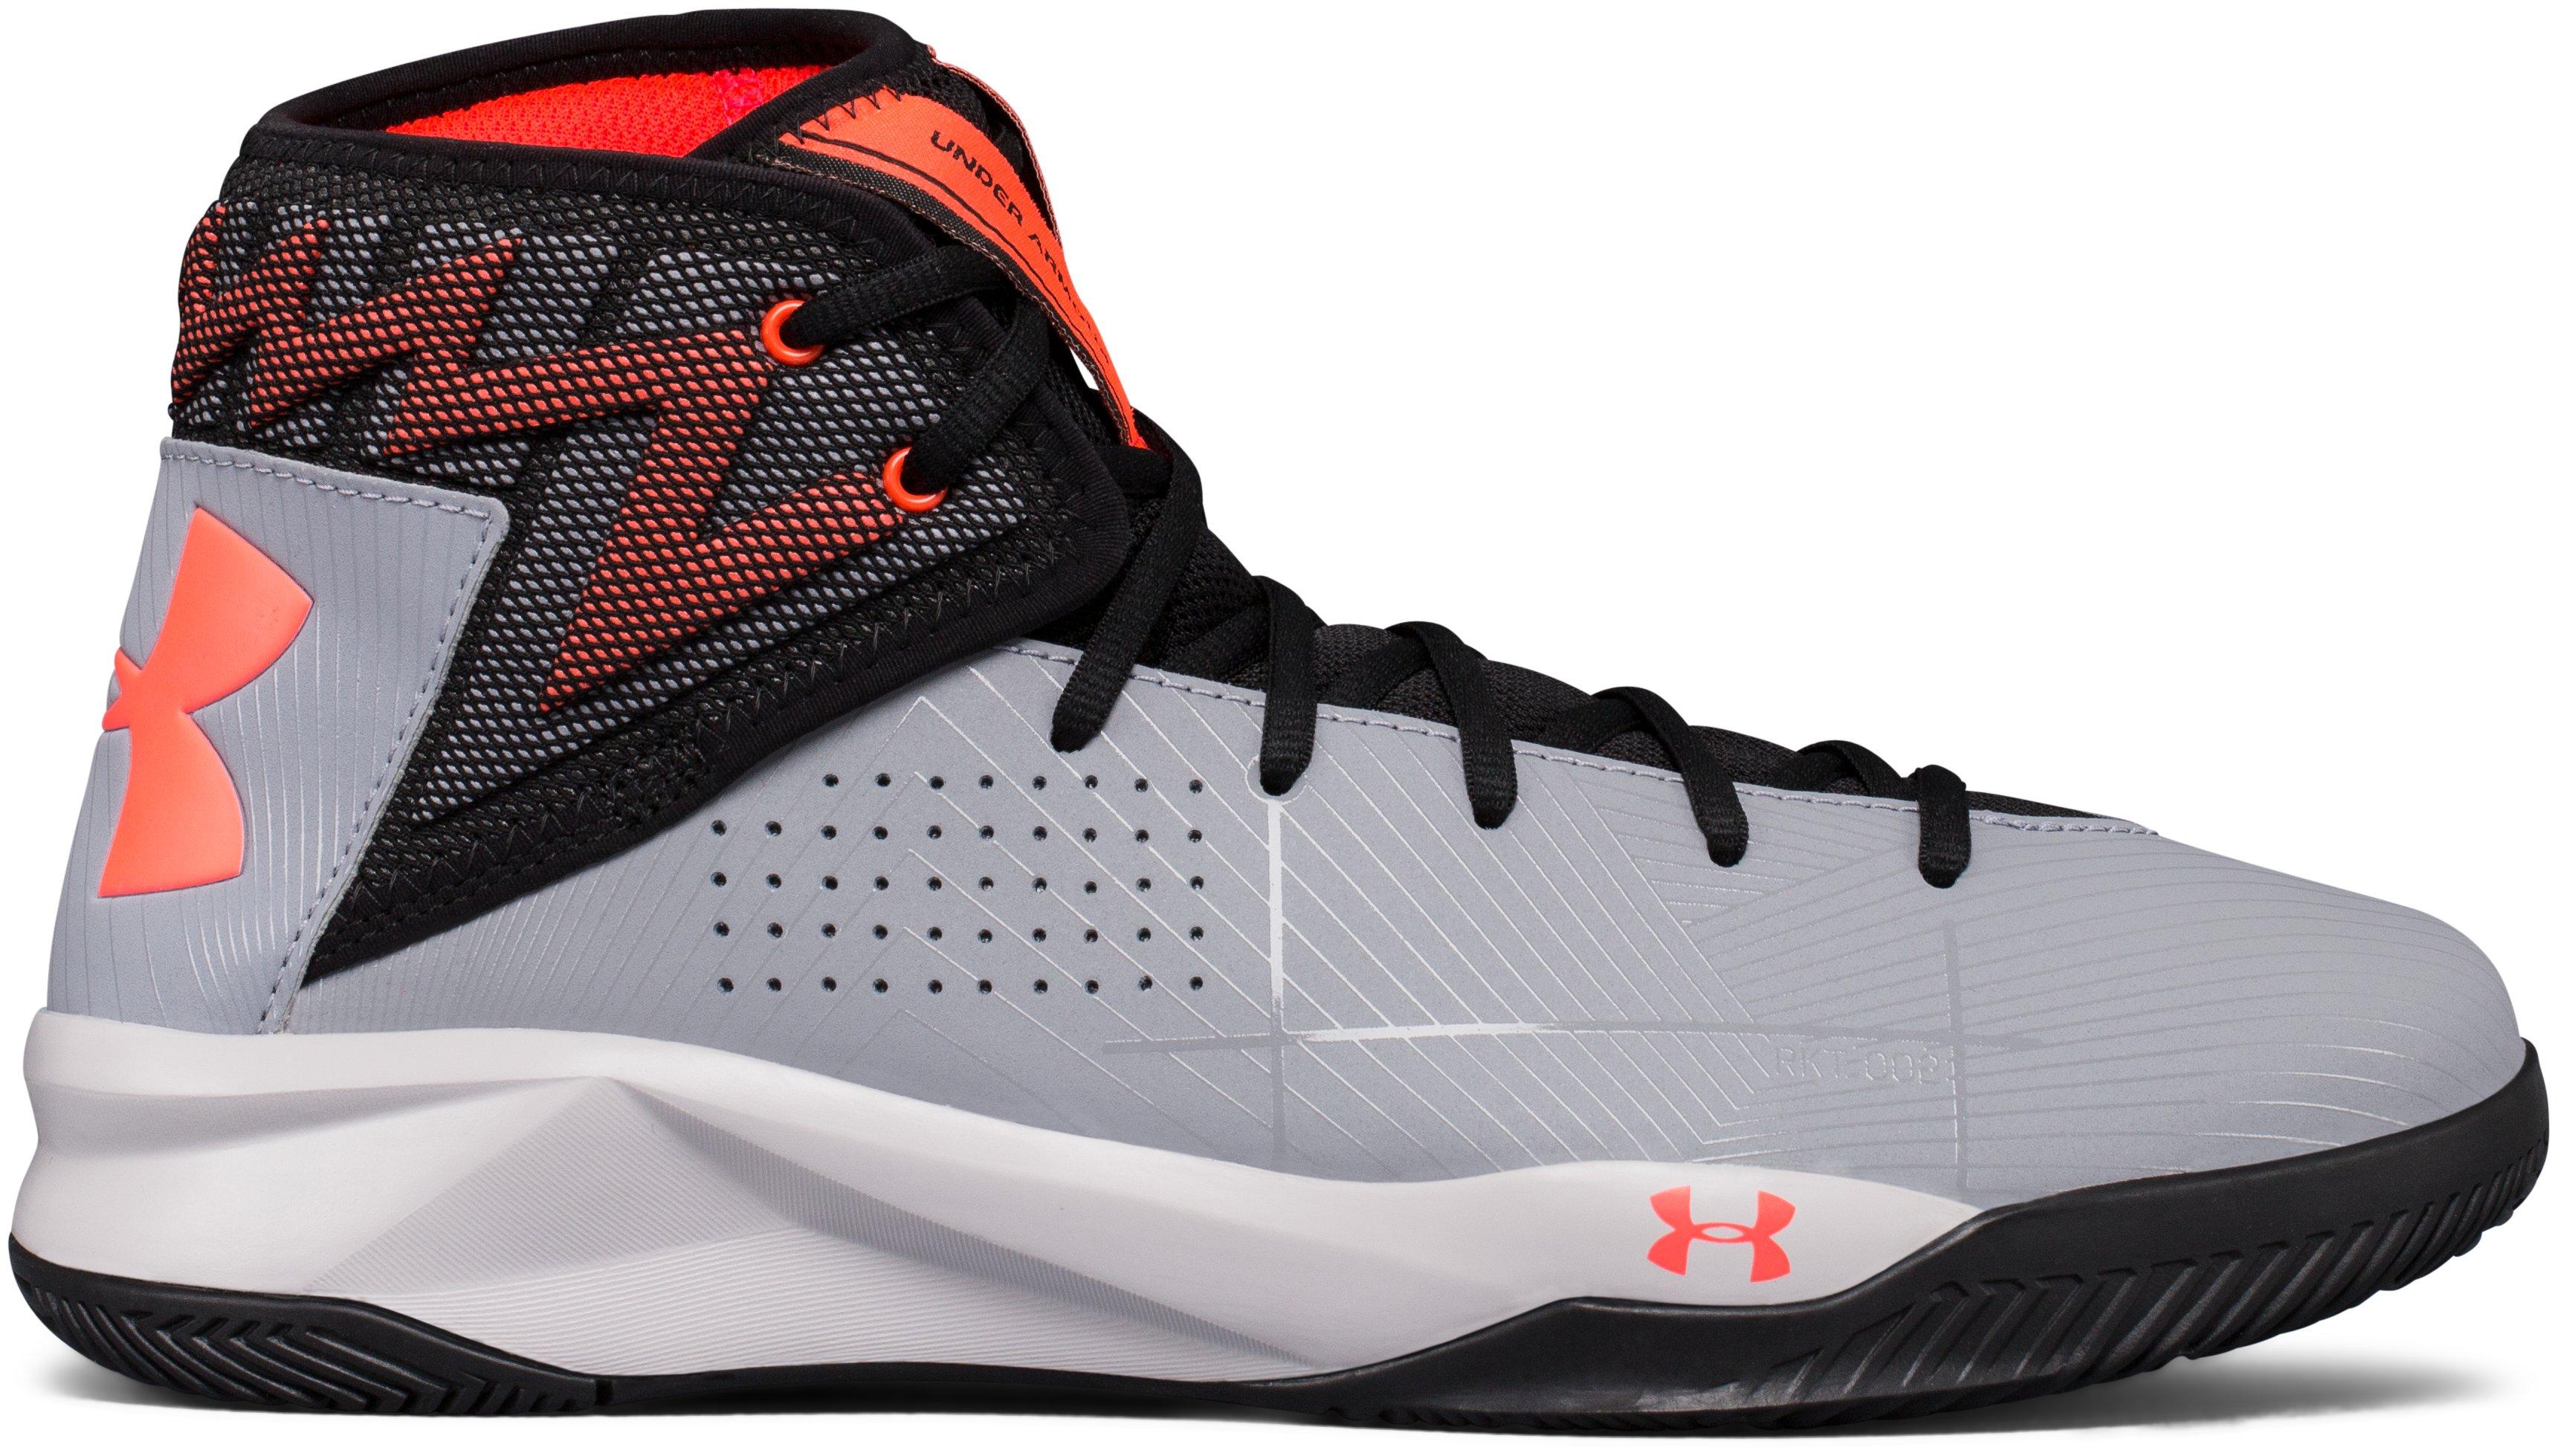 Men's UA Rocket 2 Basketball Shoes, 360 degree view